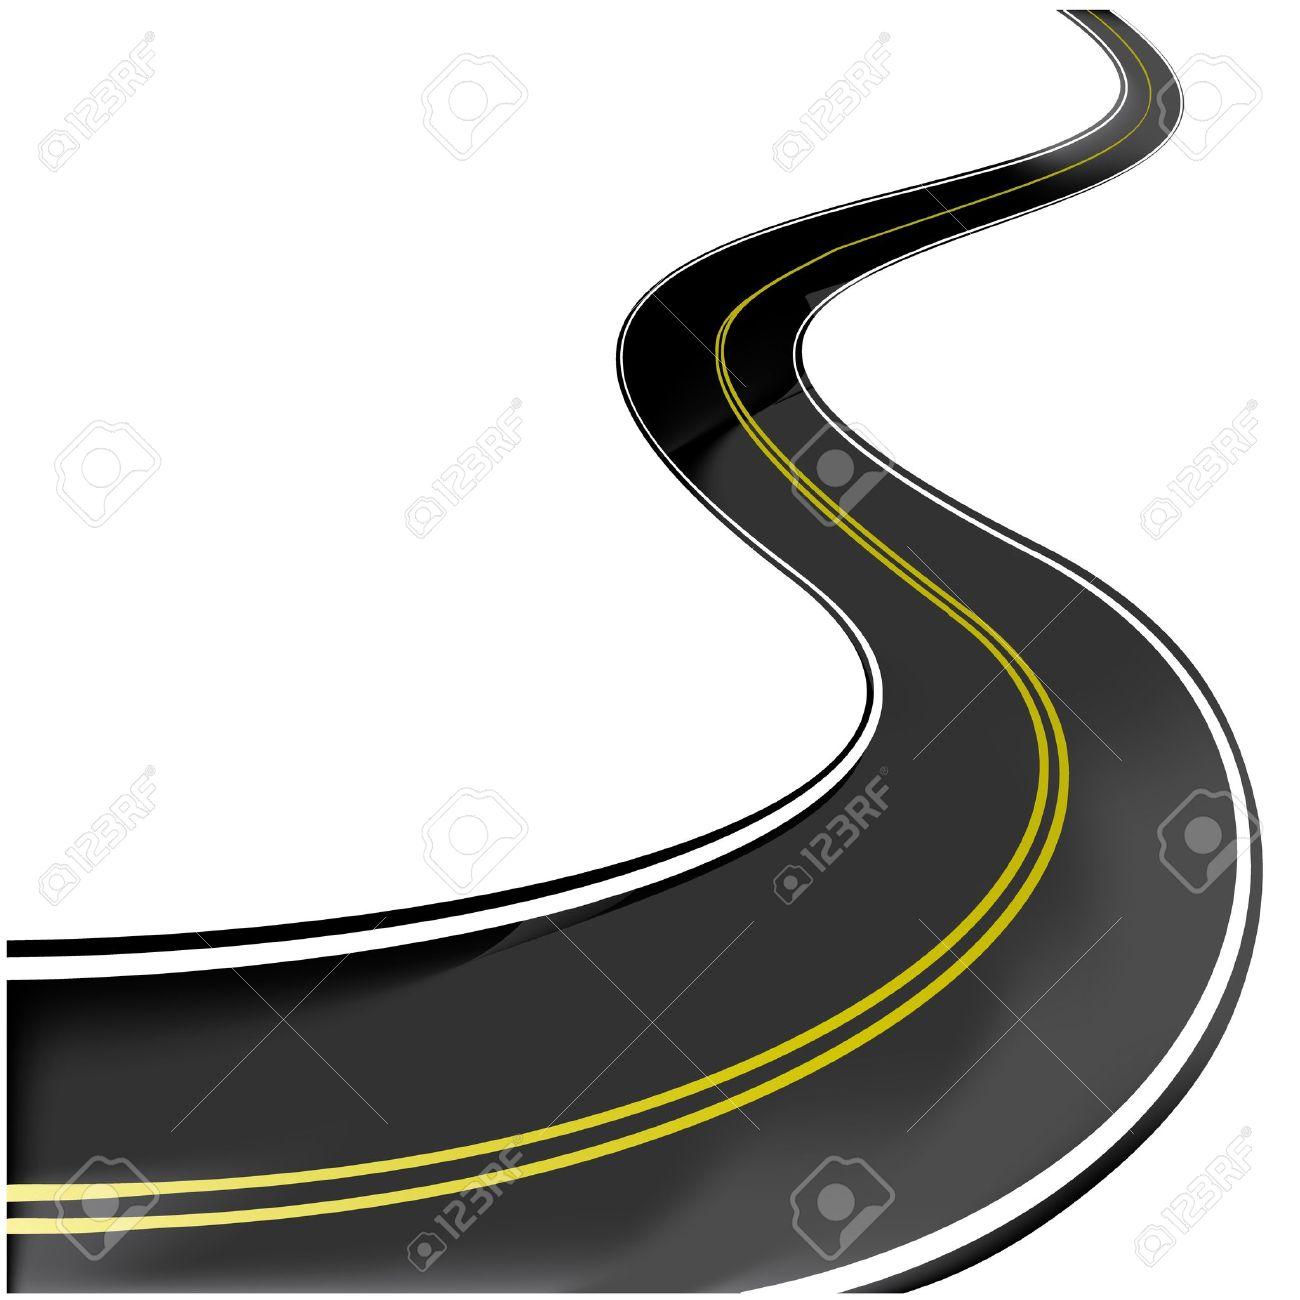 vector winding road royalty free cliparts vectors and stock rh 123rf com road vector free download road vector free download